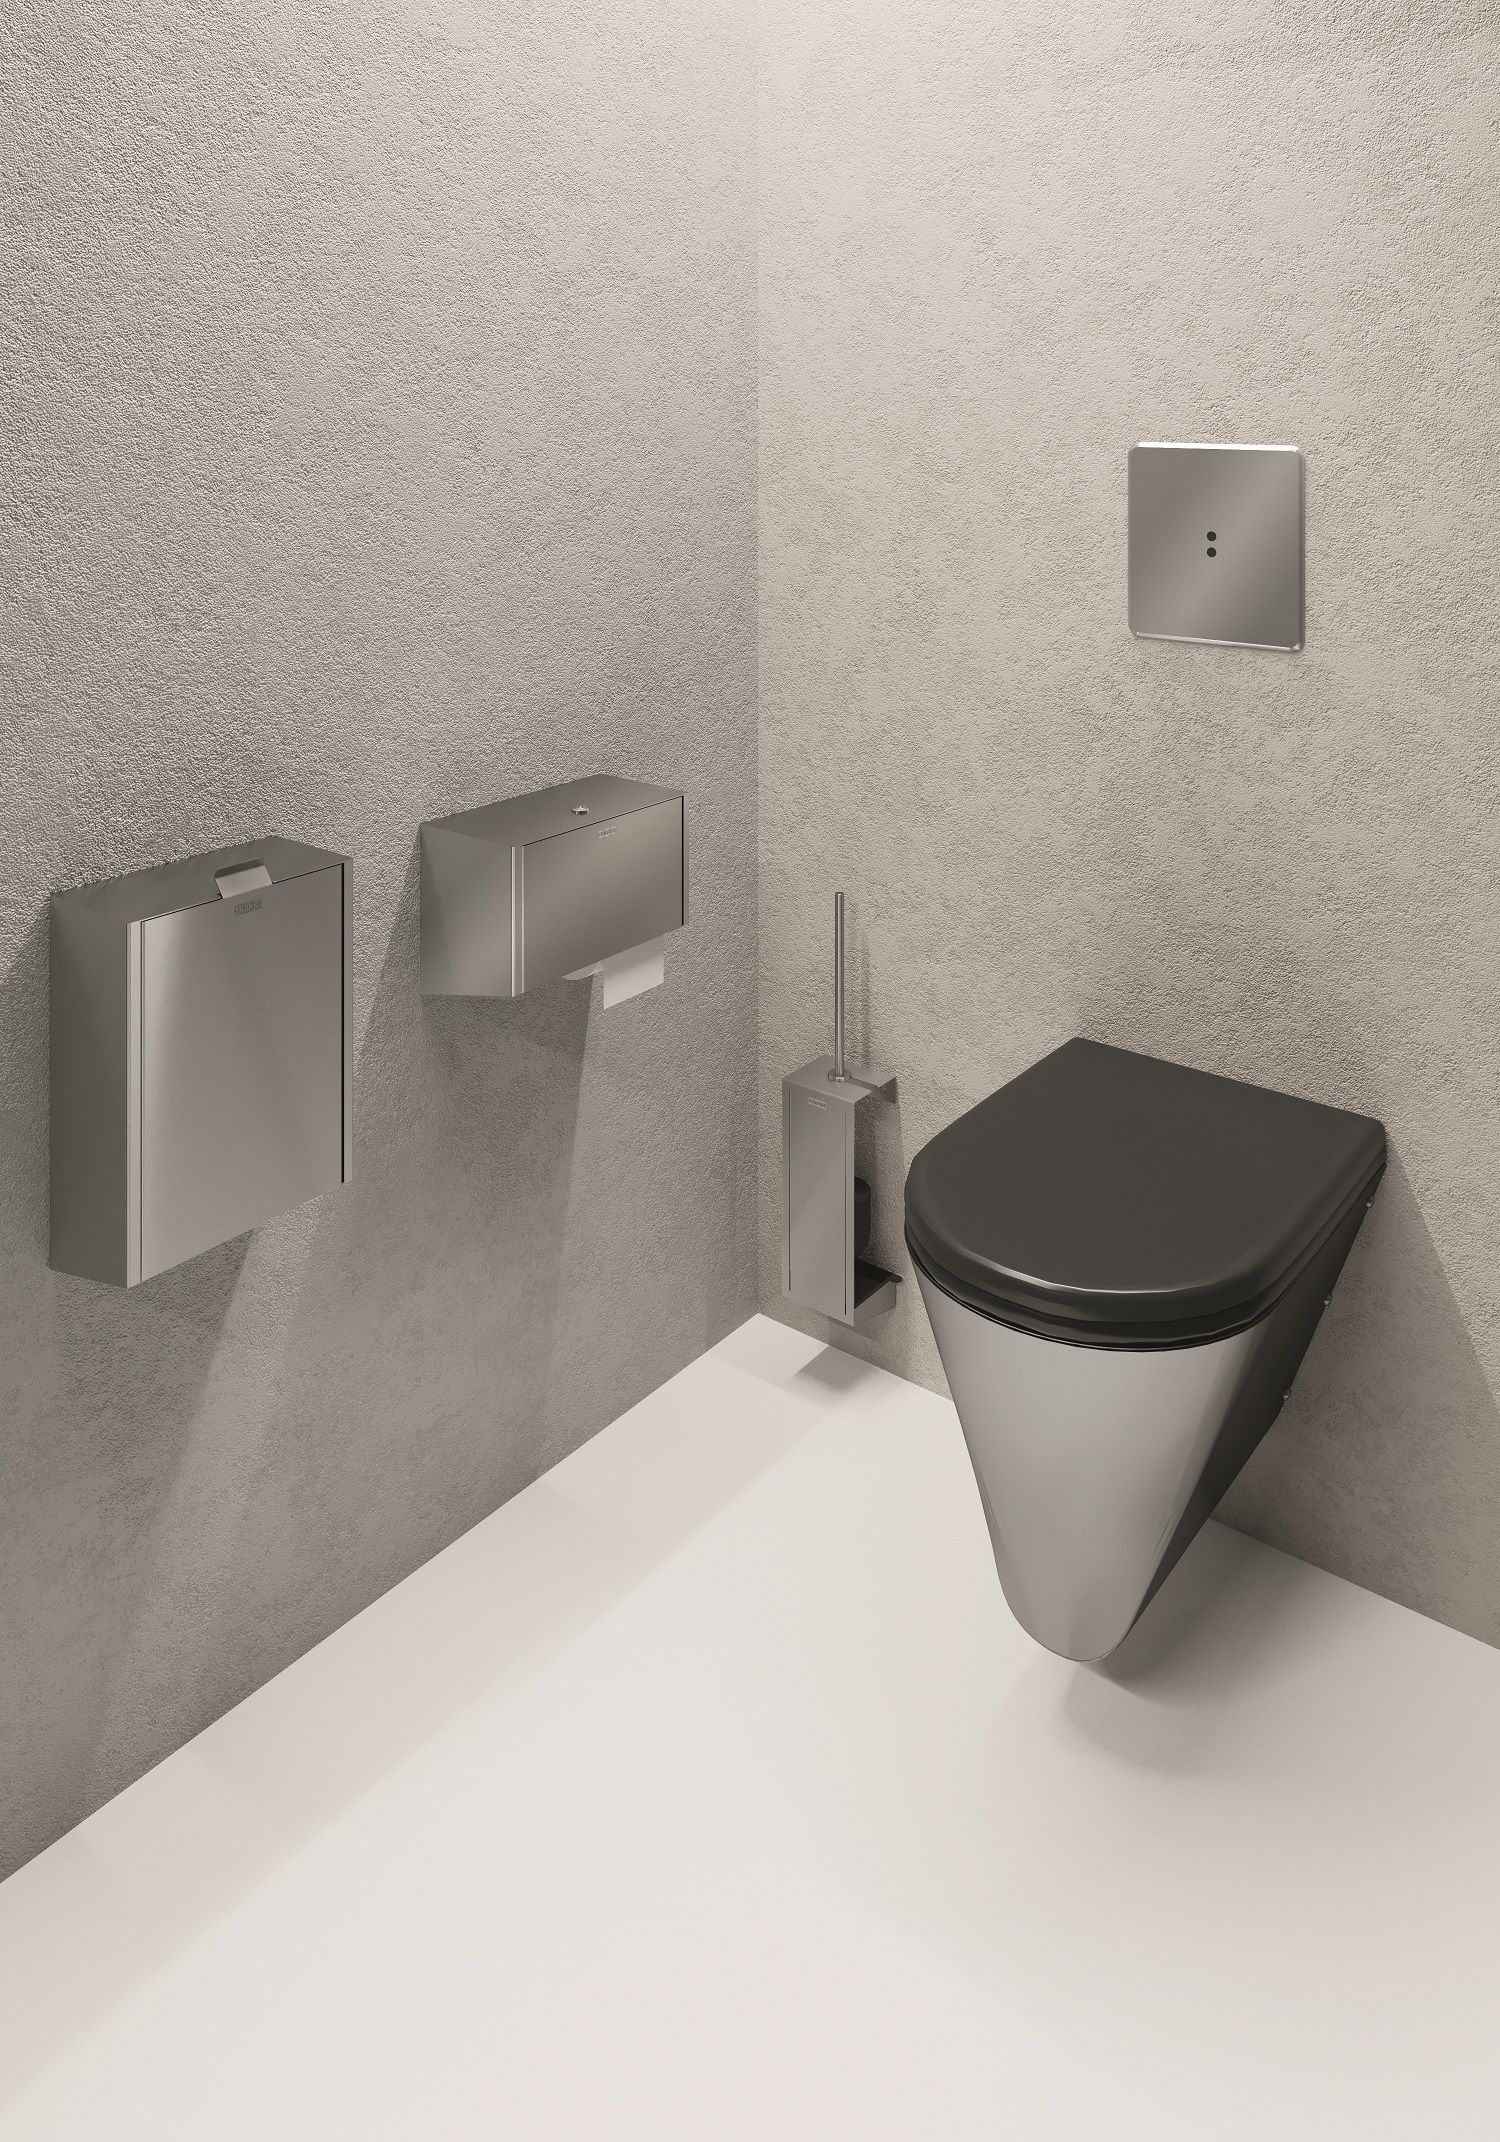 Franke Exos Washroom Accessories Stainless